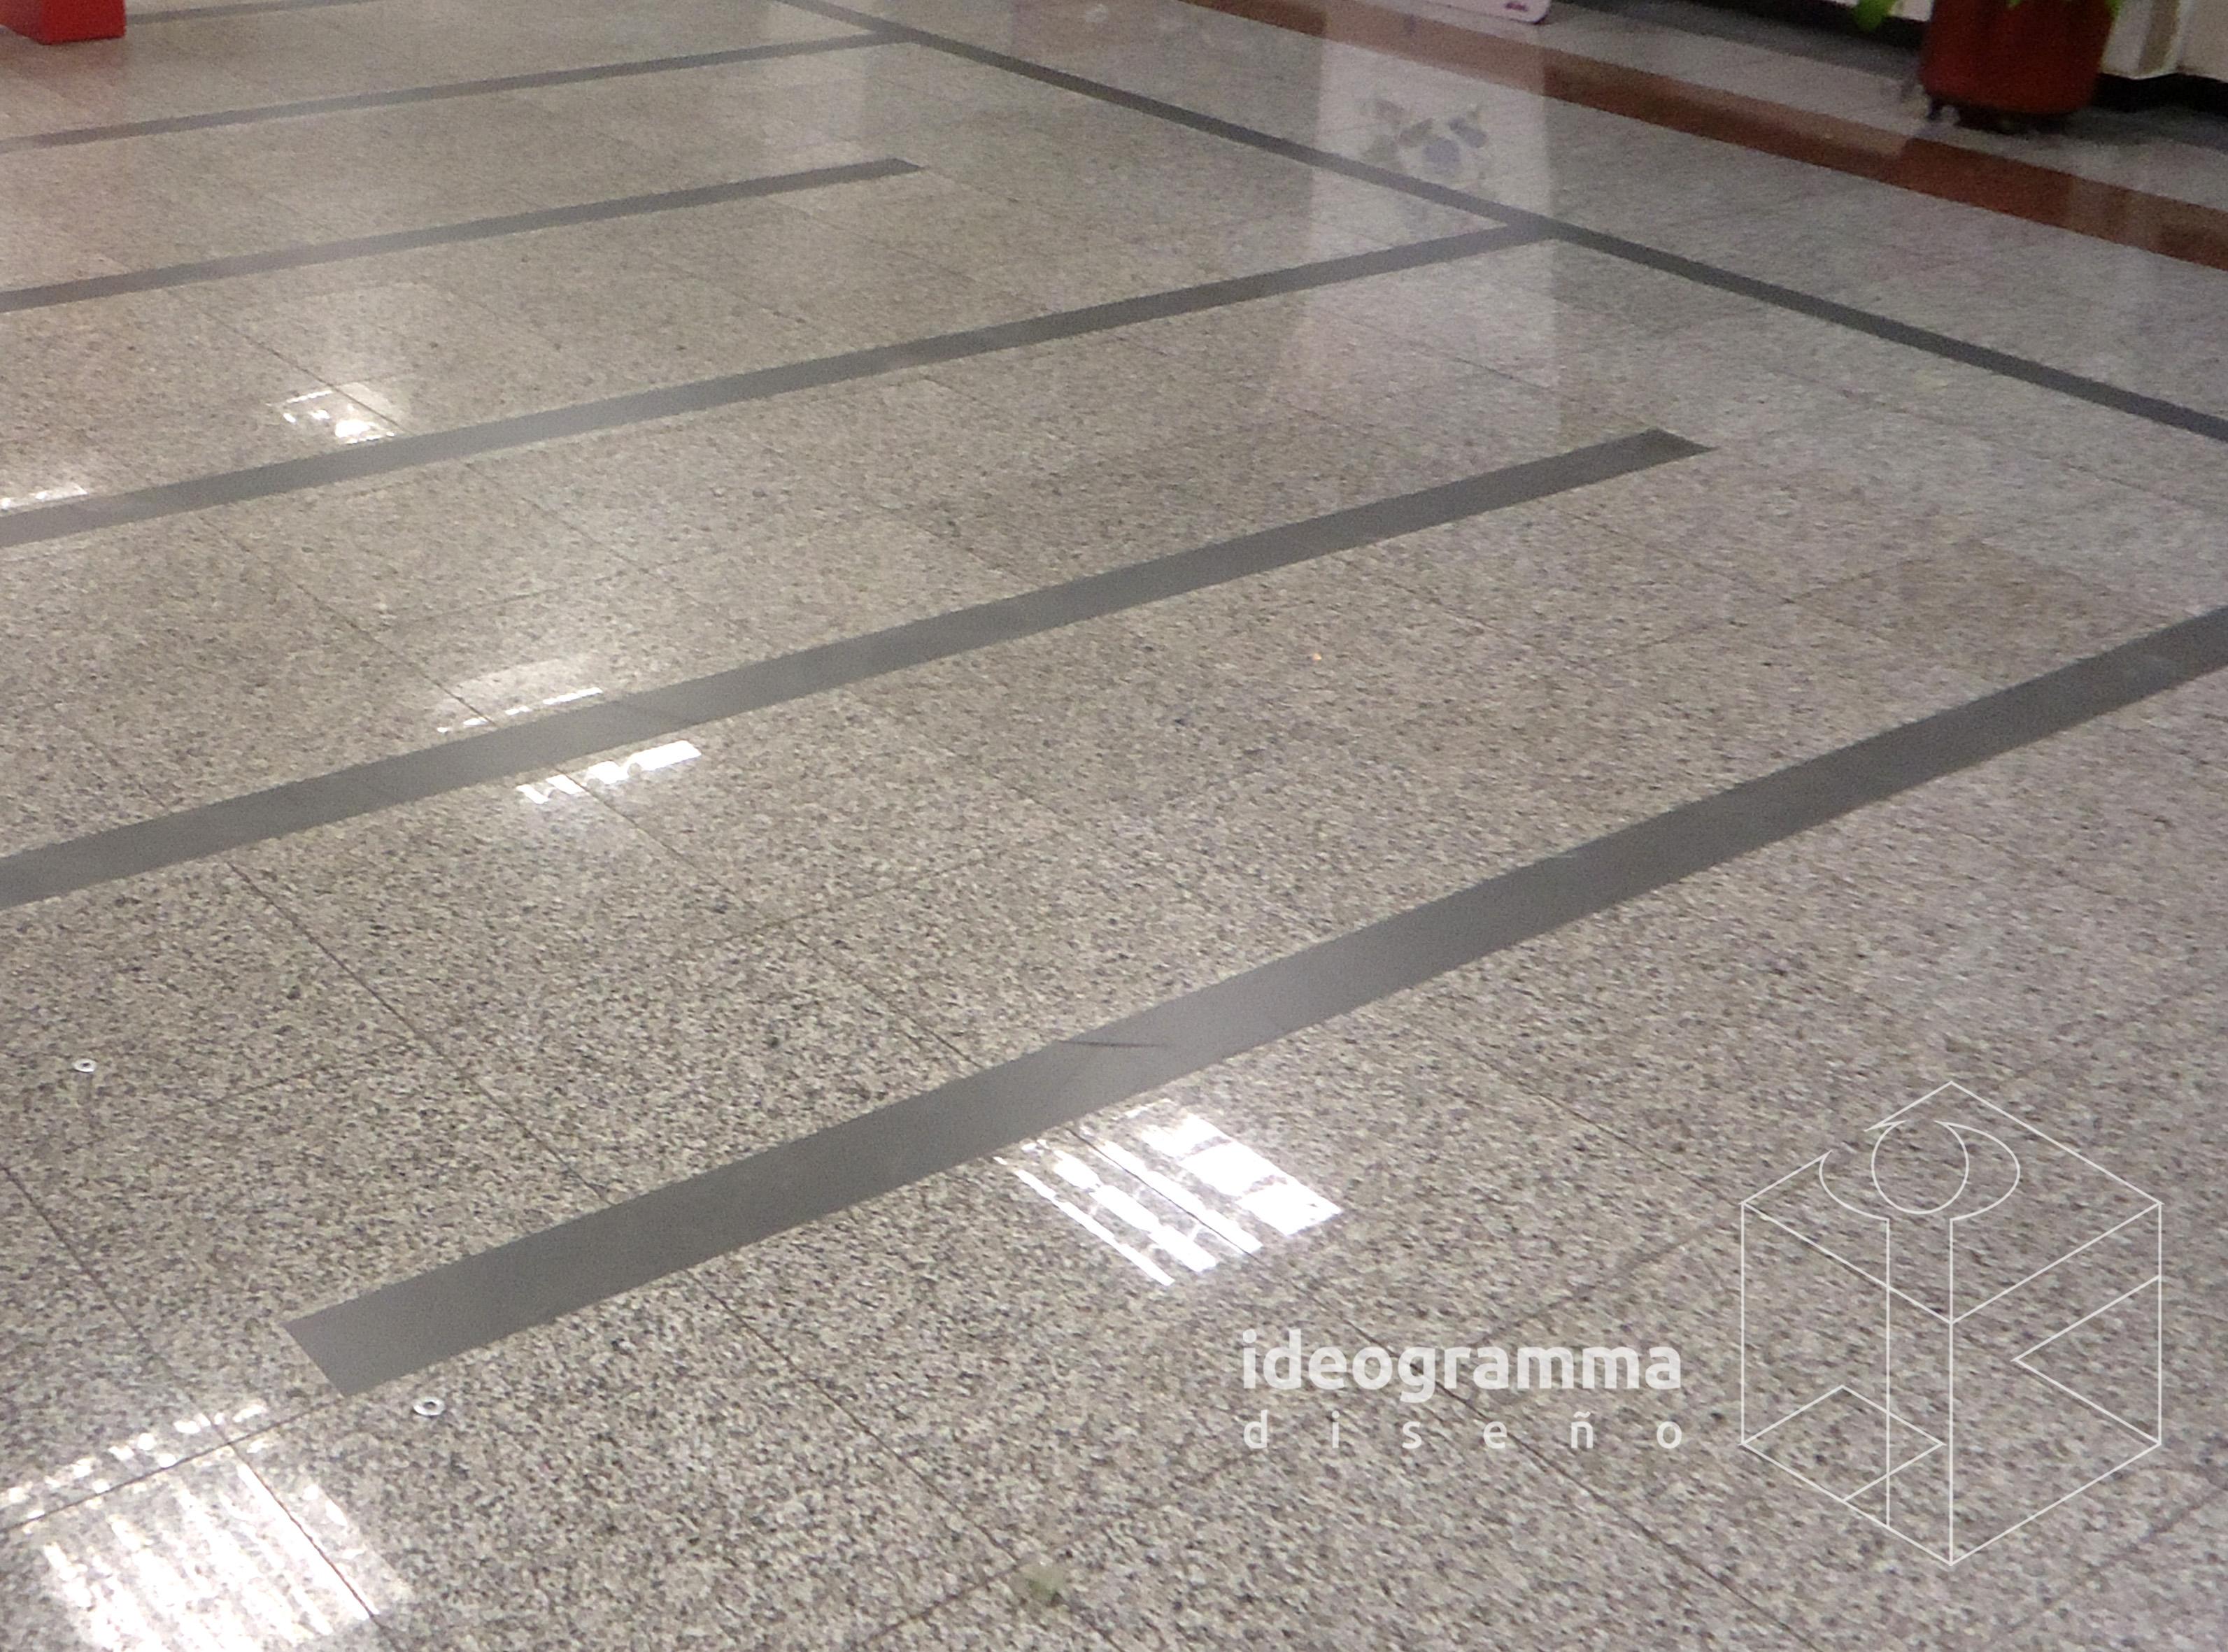 IDEO- marcas piso 2.jpg